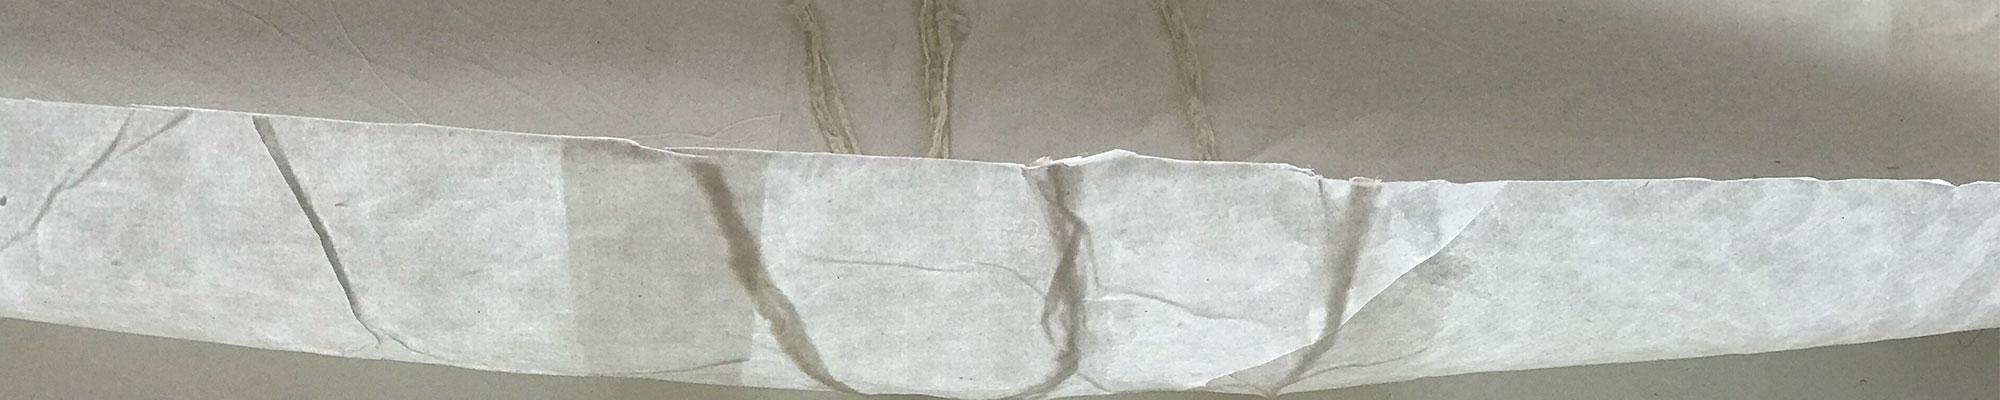 papieren schaal detail © Anne-Riet de Boer - slider